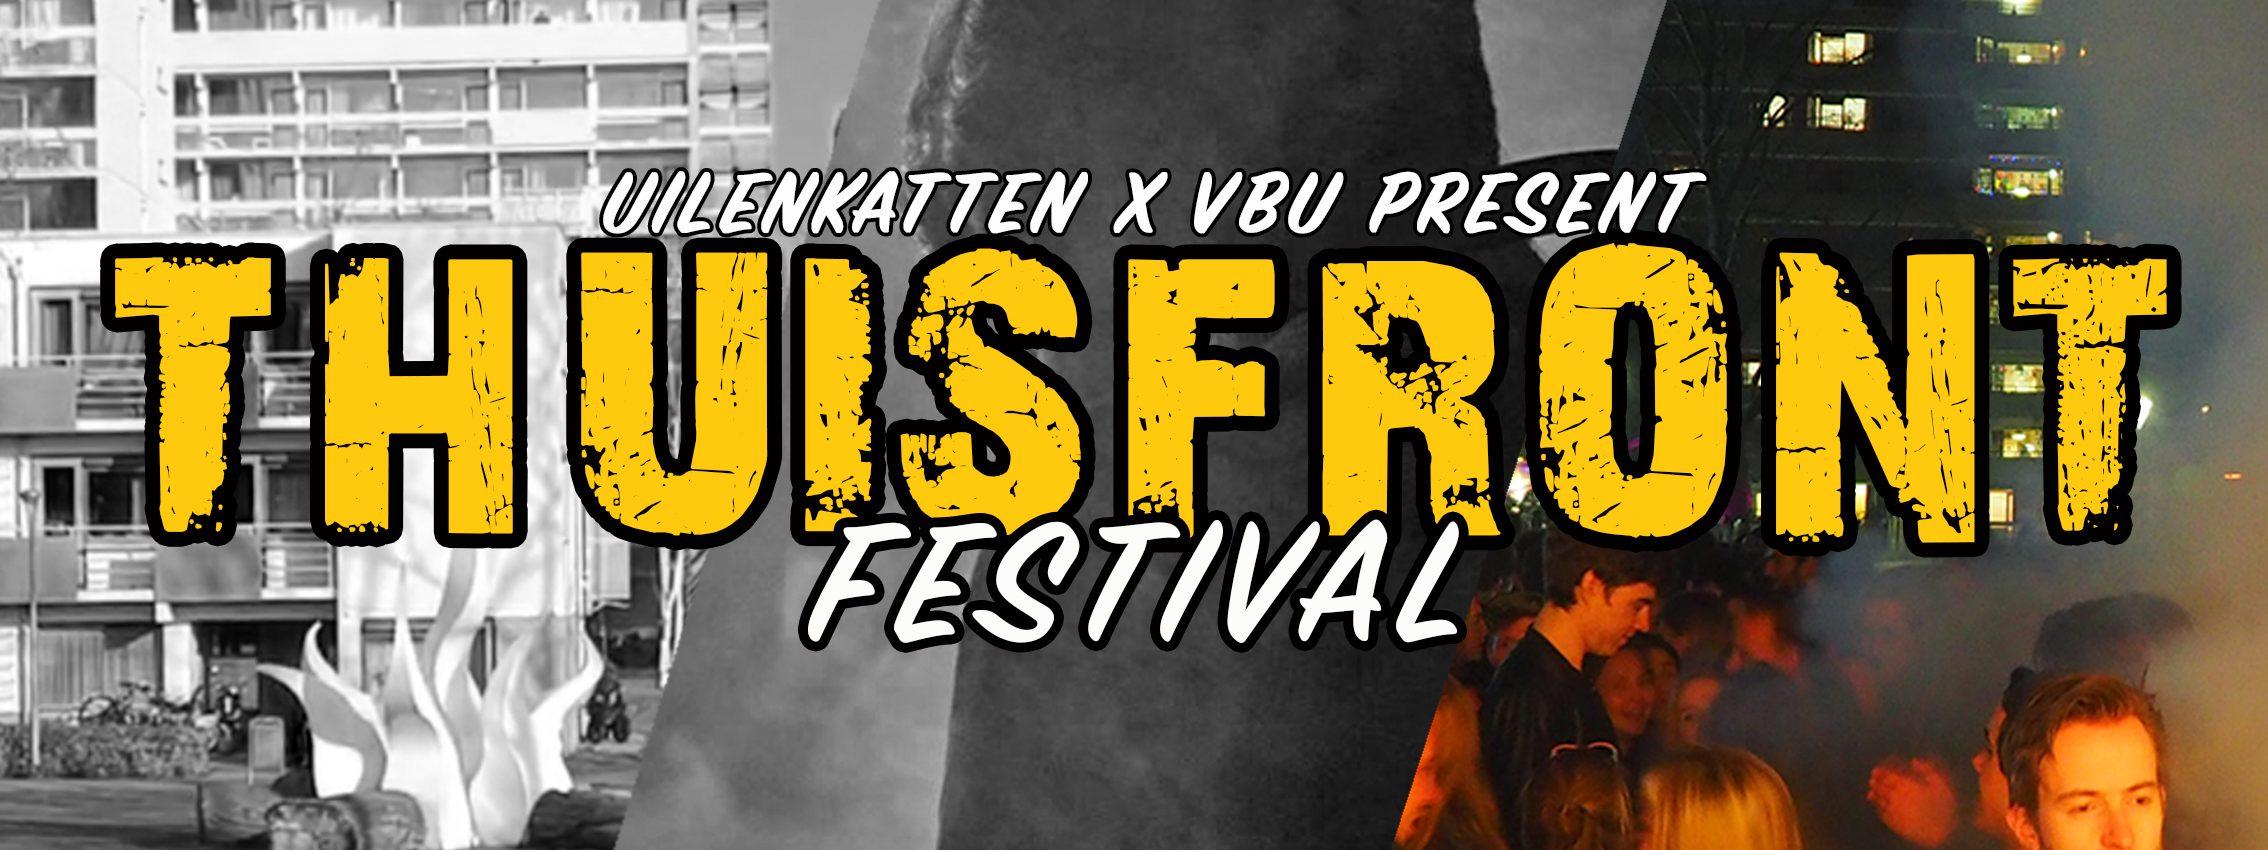 Maandag 4 juni: Thuisfront Festival